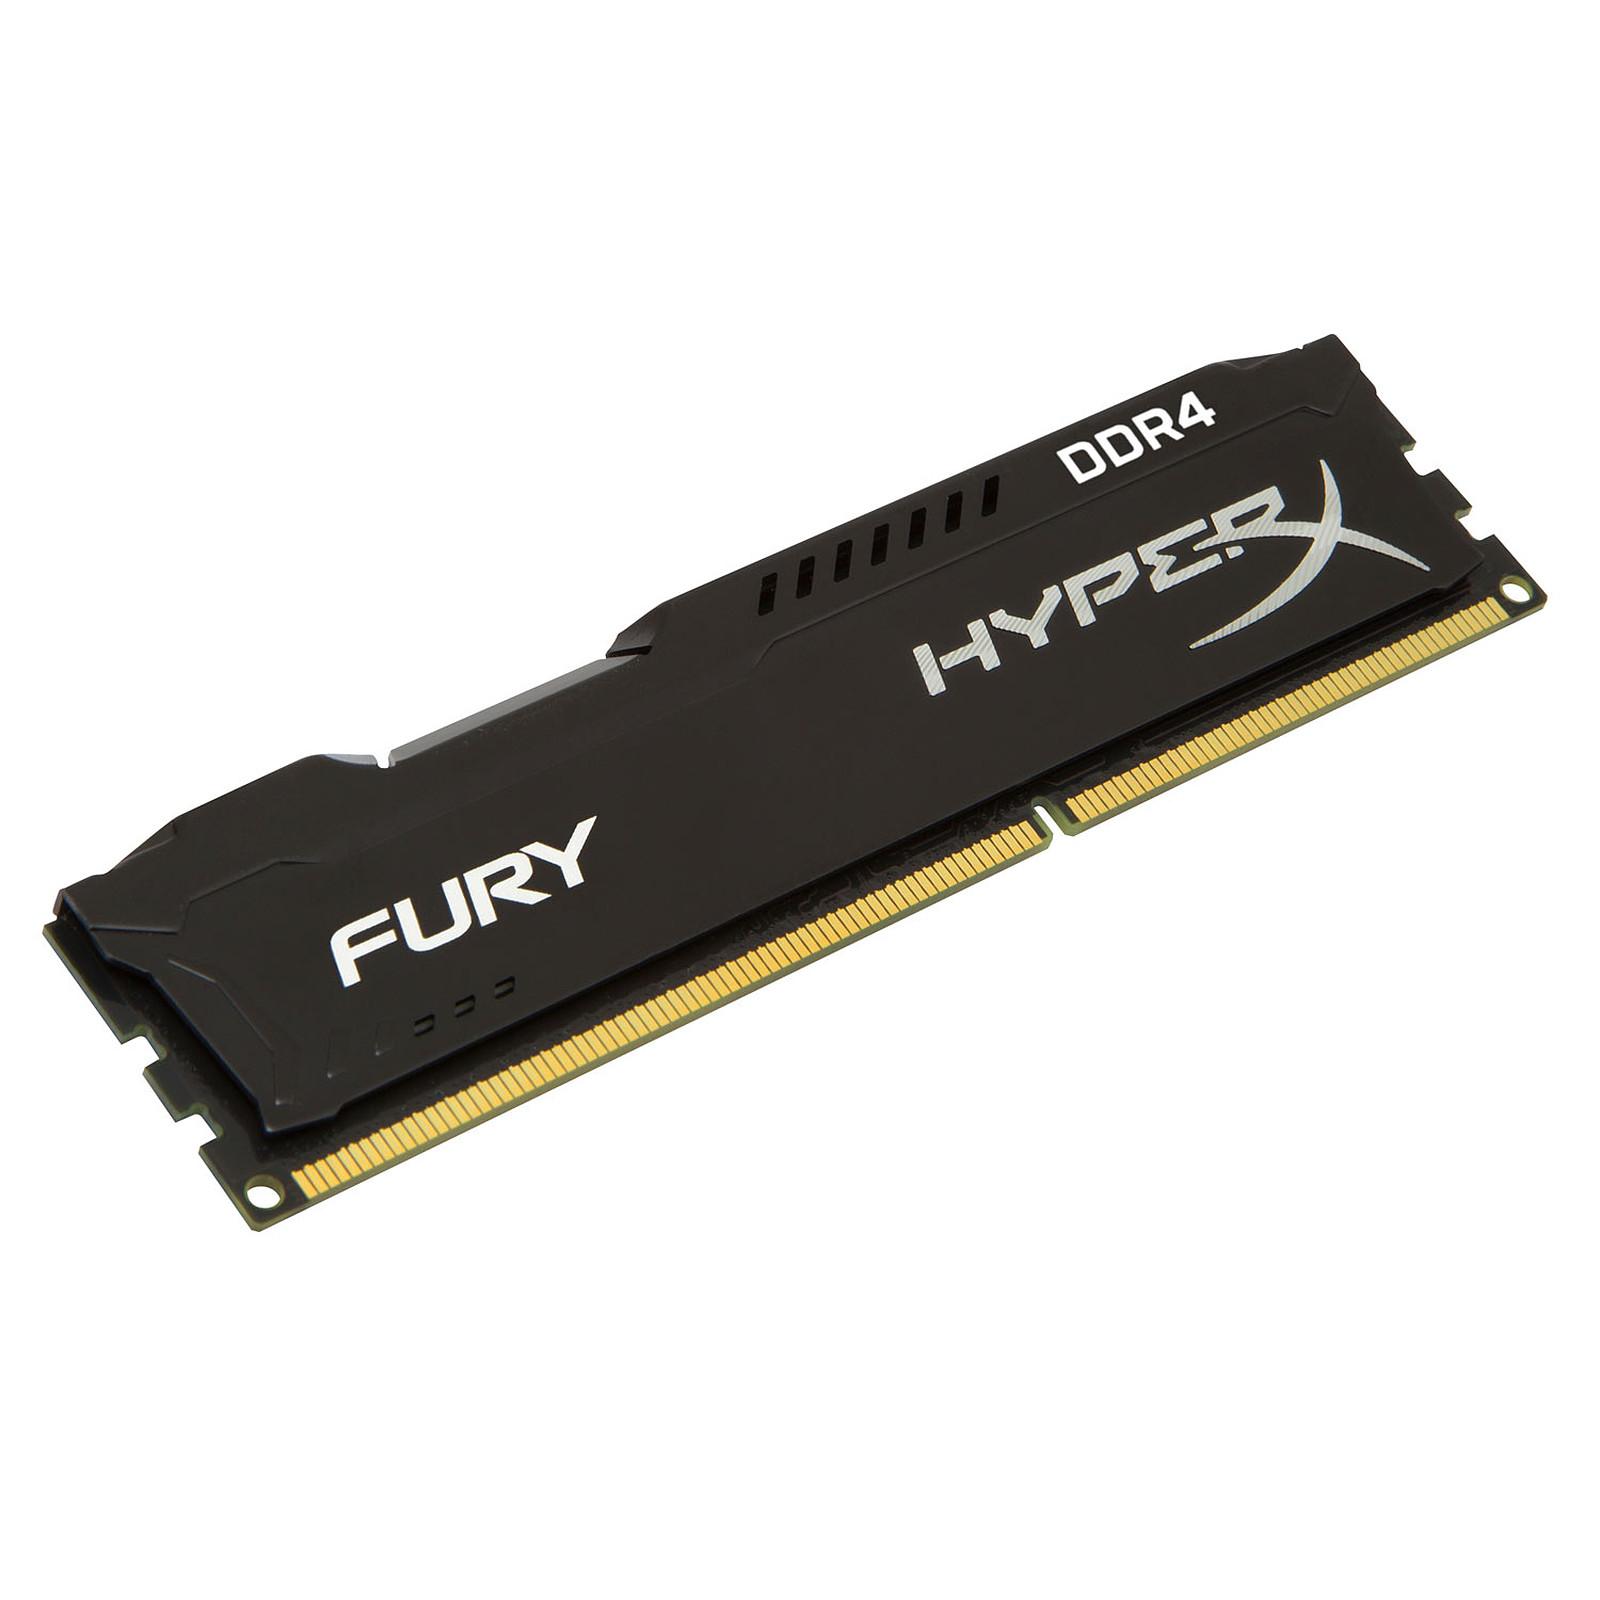 HyperX Fury Noir 8 Go DDR4 2666 MHz CL15